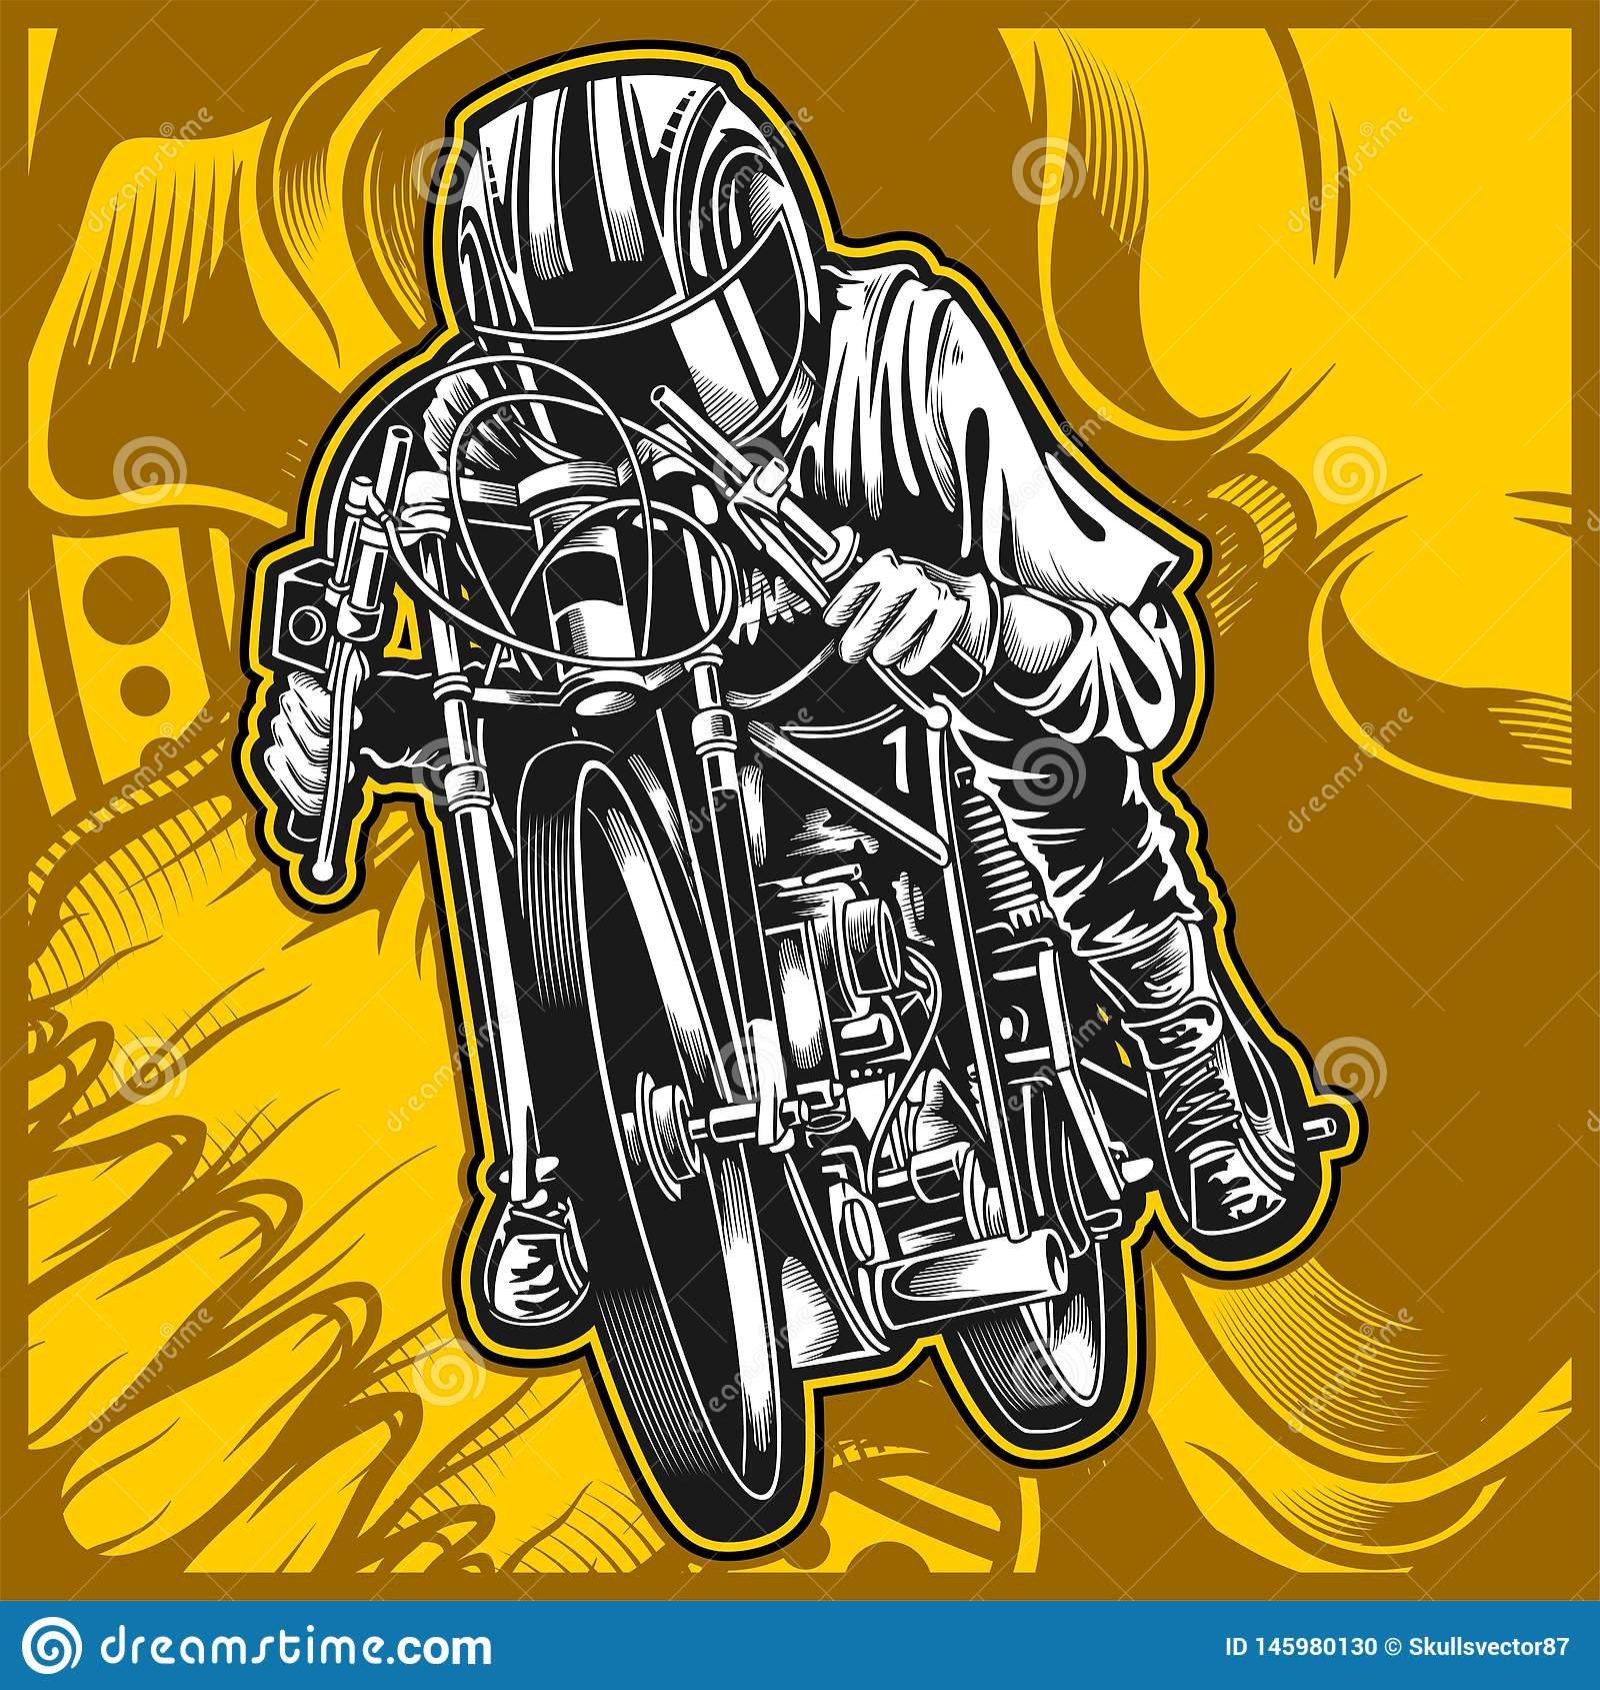 Motorcycle racing vector hand drawing